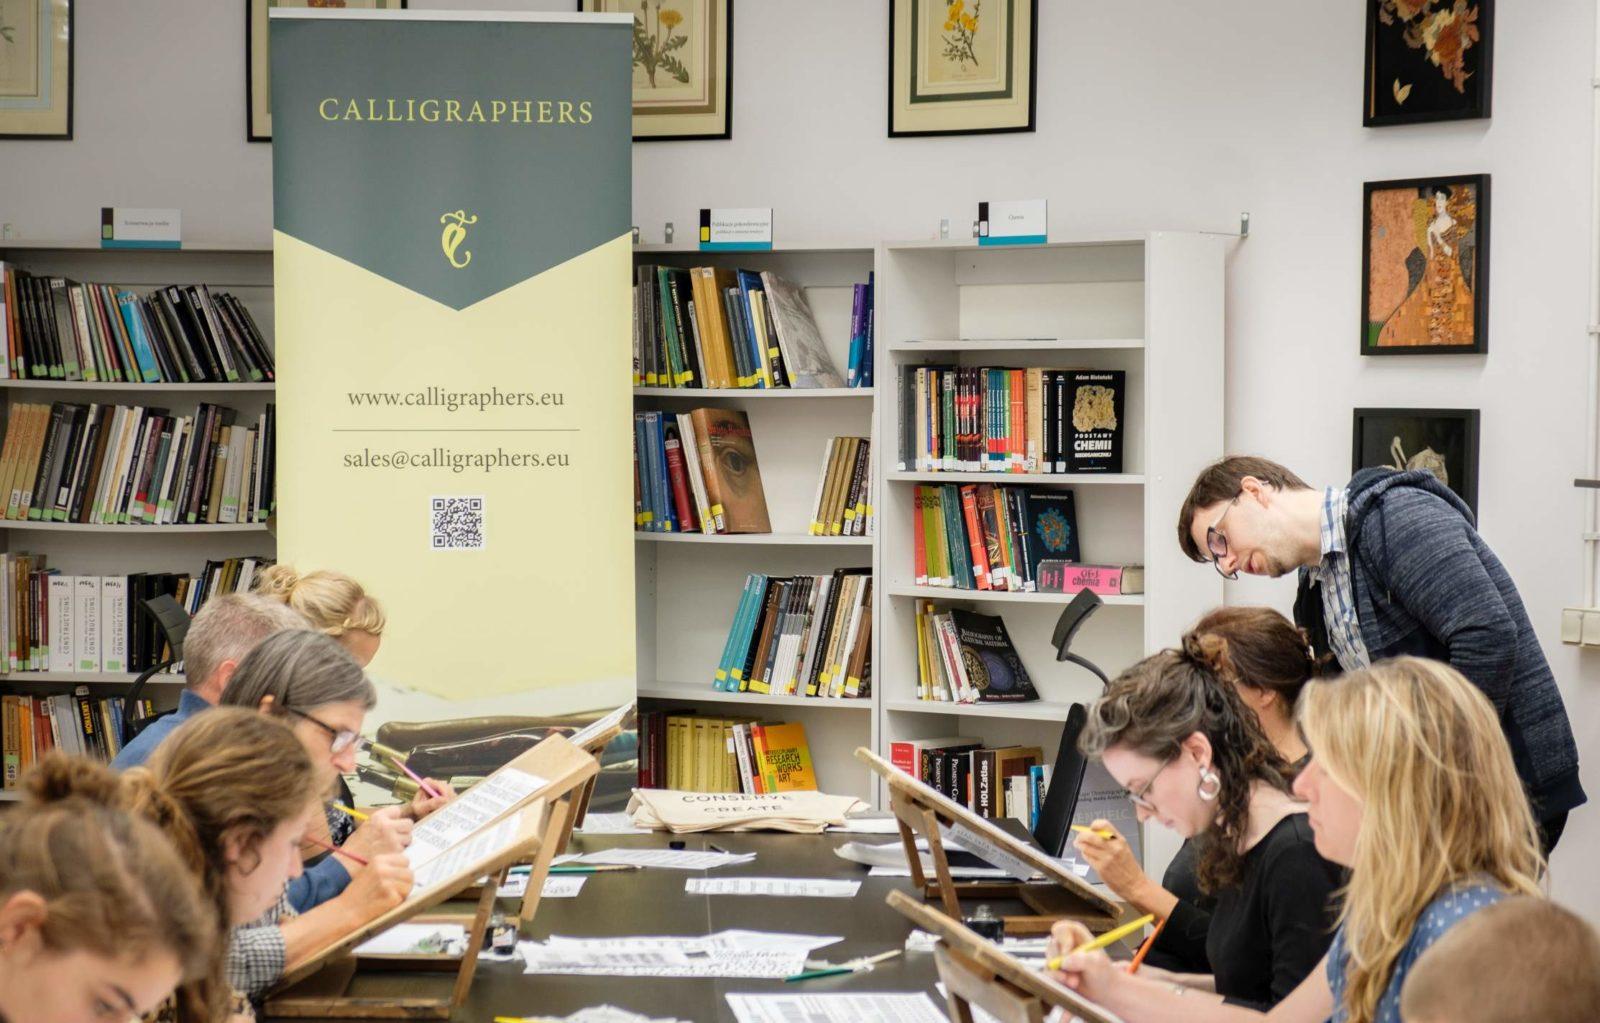 Warschau_2019_Workshop_Calligraphy_IADA_209